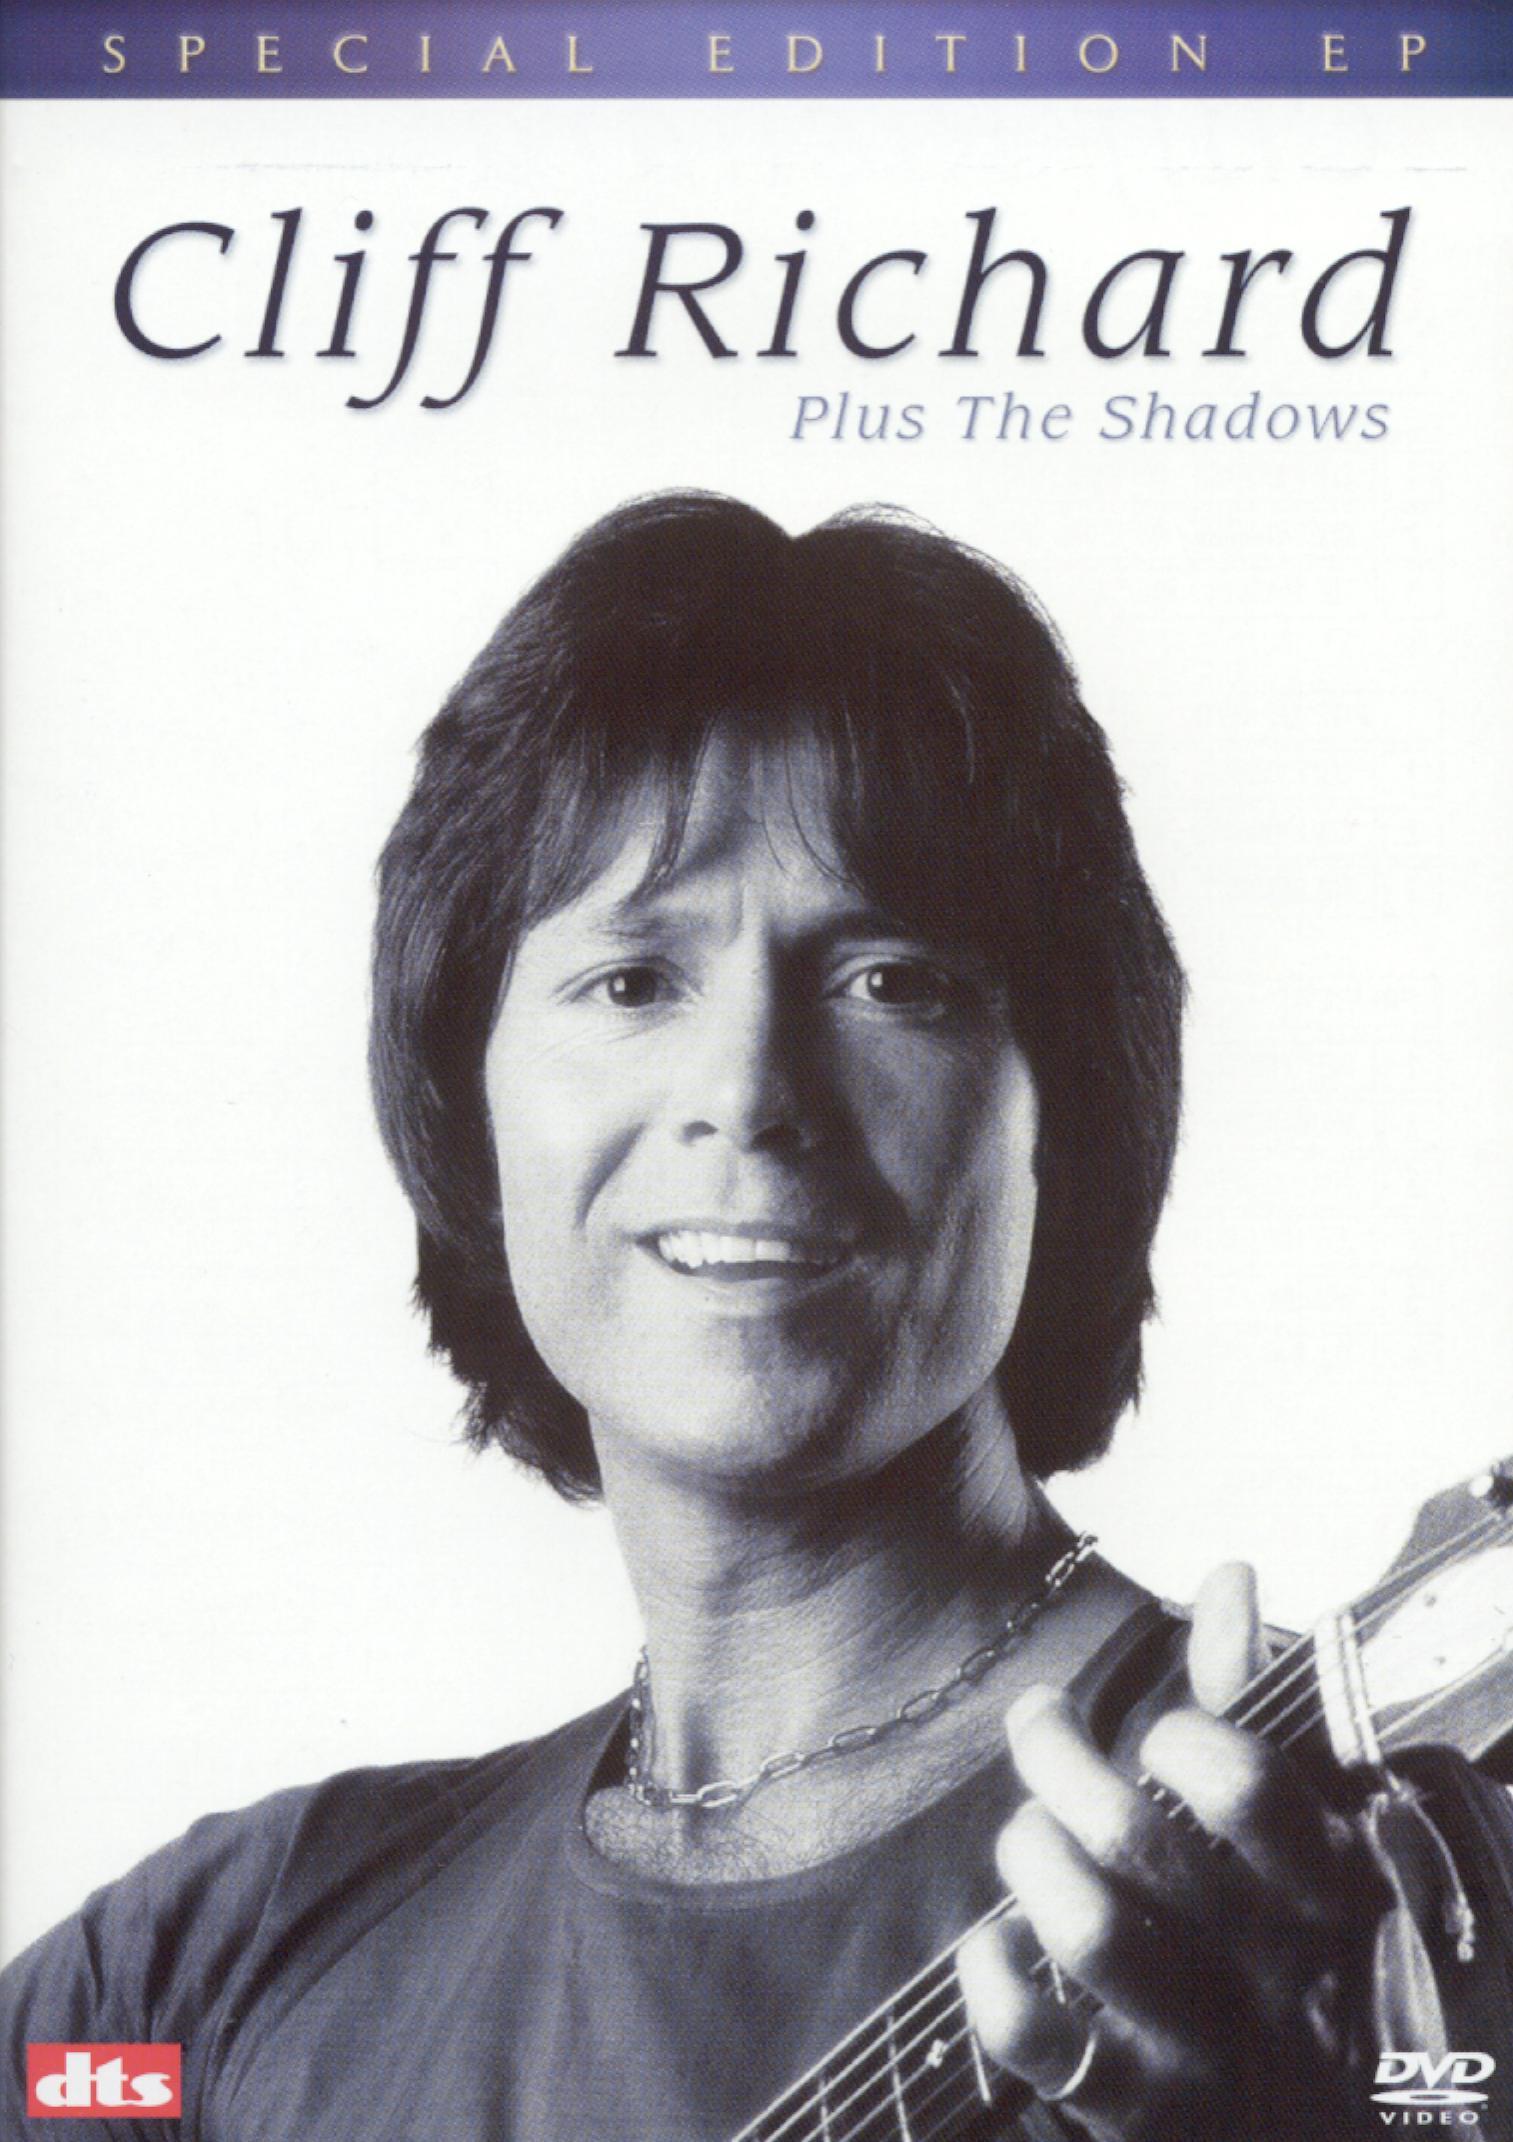 Cliff Richard EP